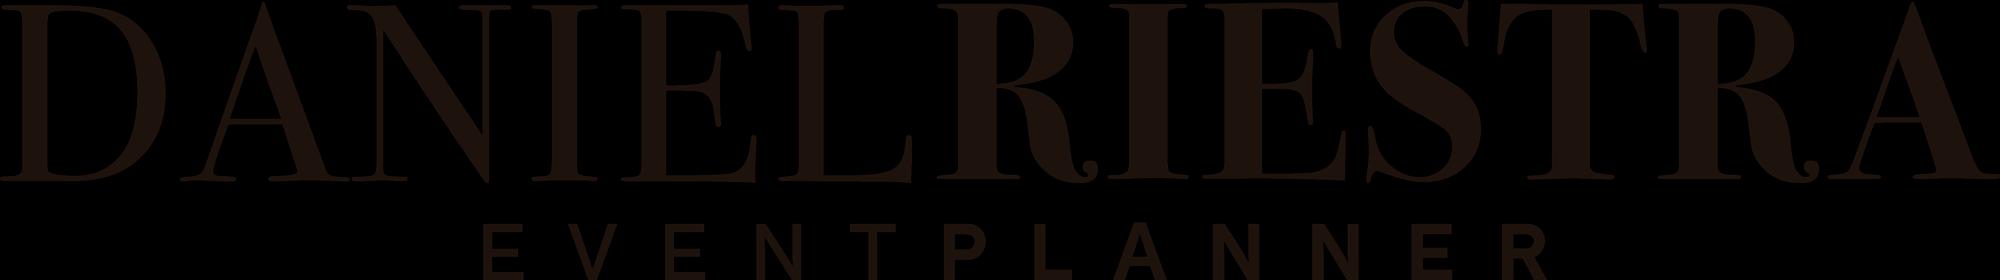 daniel riestra logo